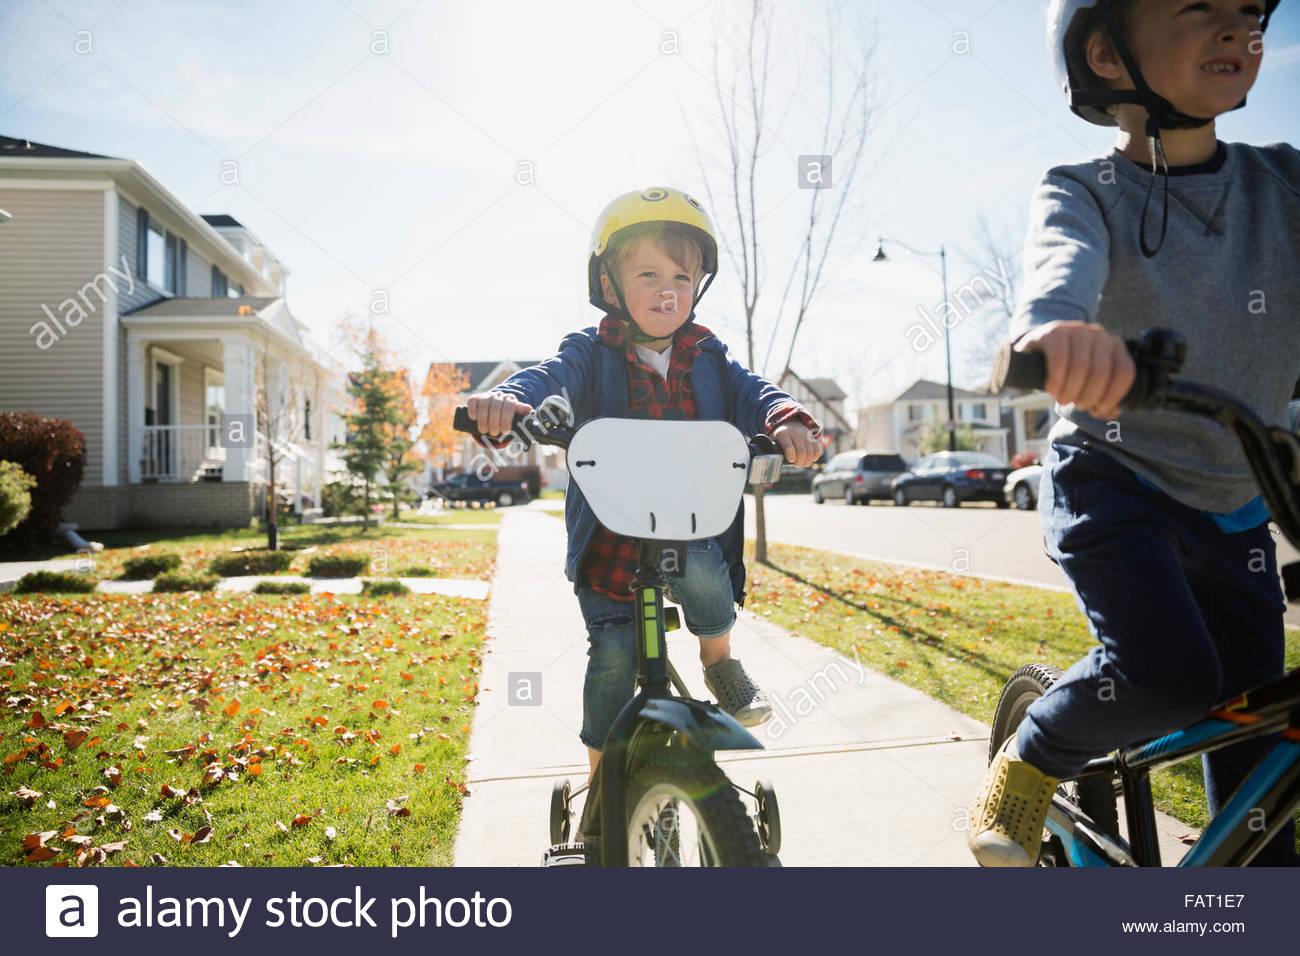 Boys riding bikes on autumn neighborhood sidewalk - Stock Image